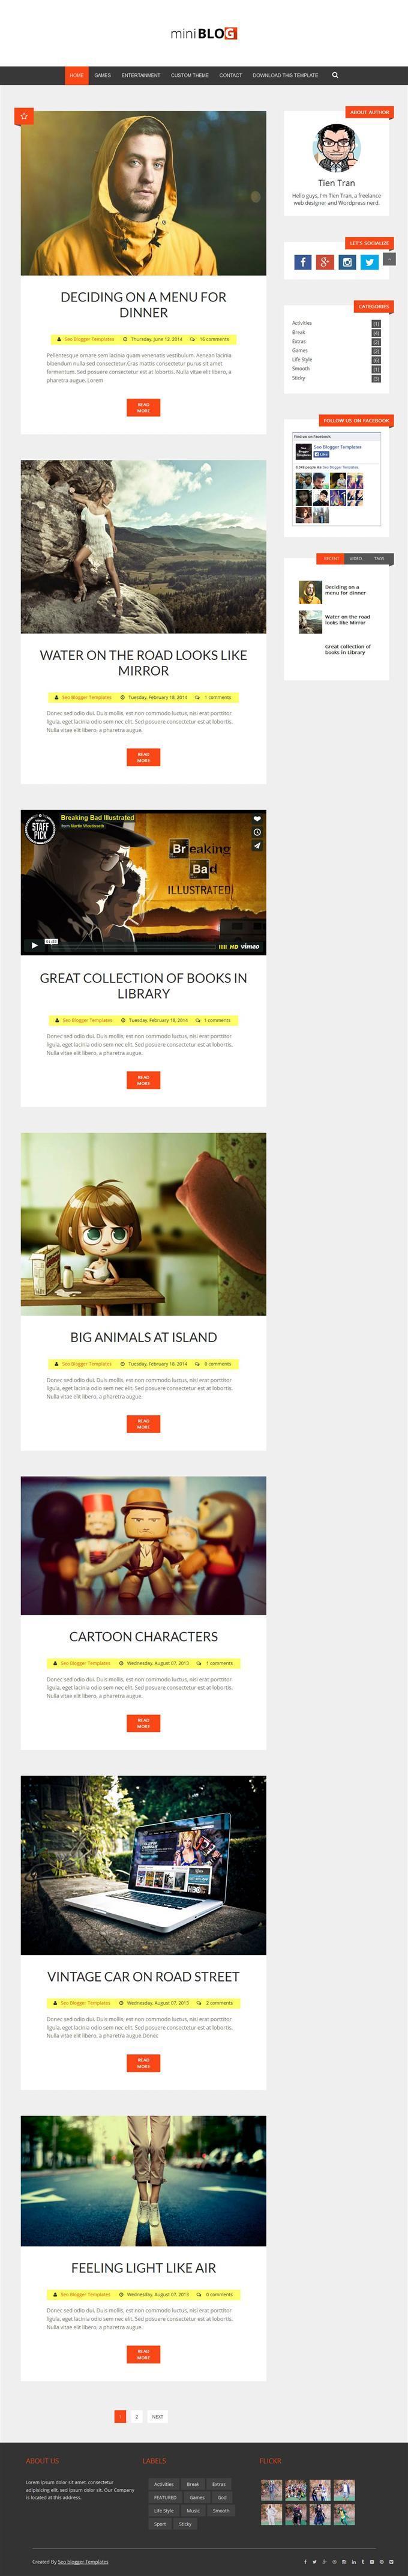 miniblog_responsive_blogger_template